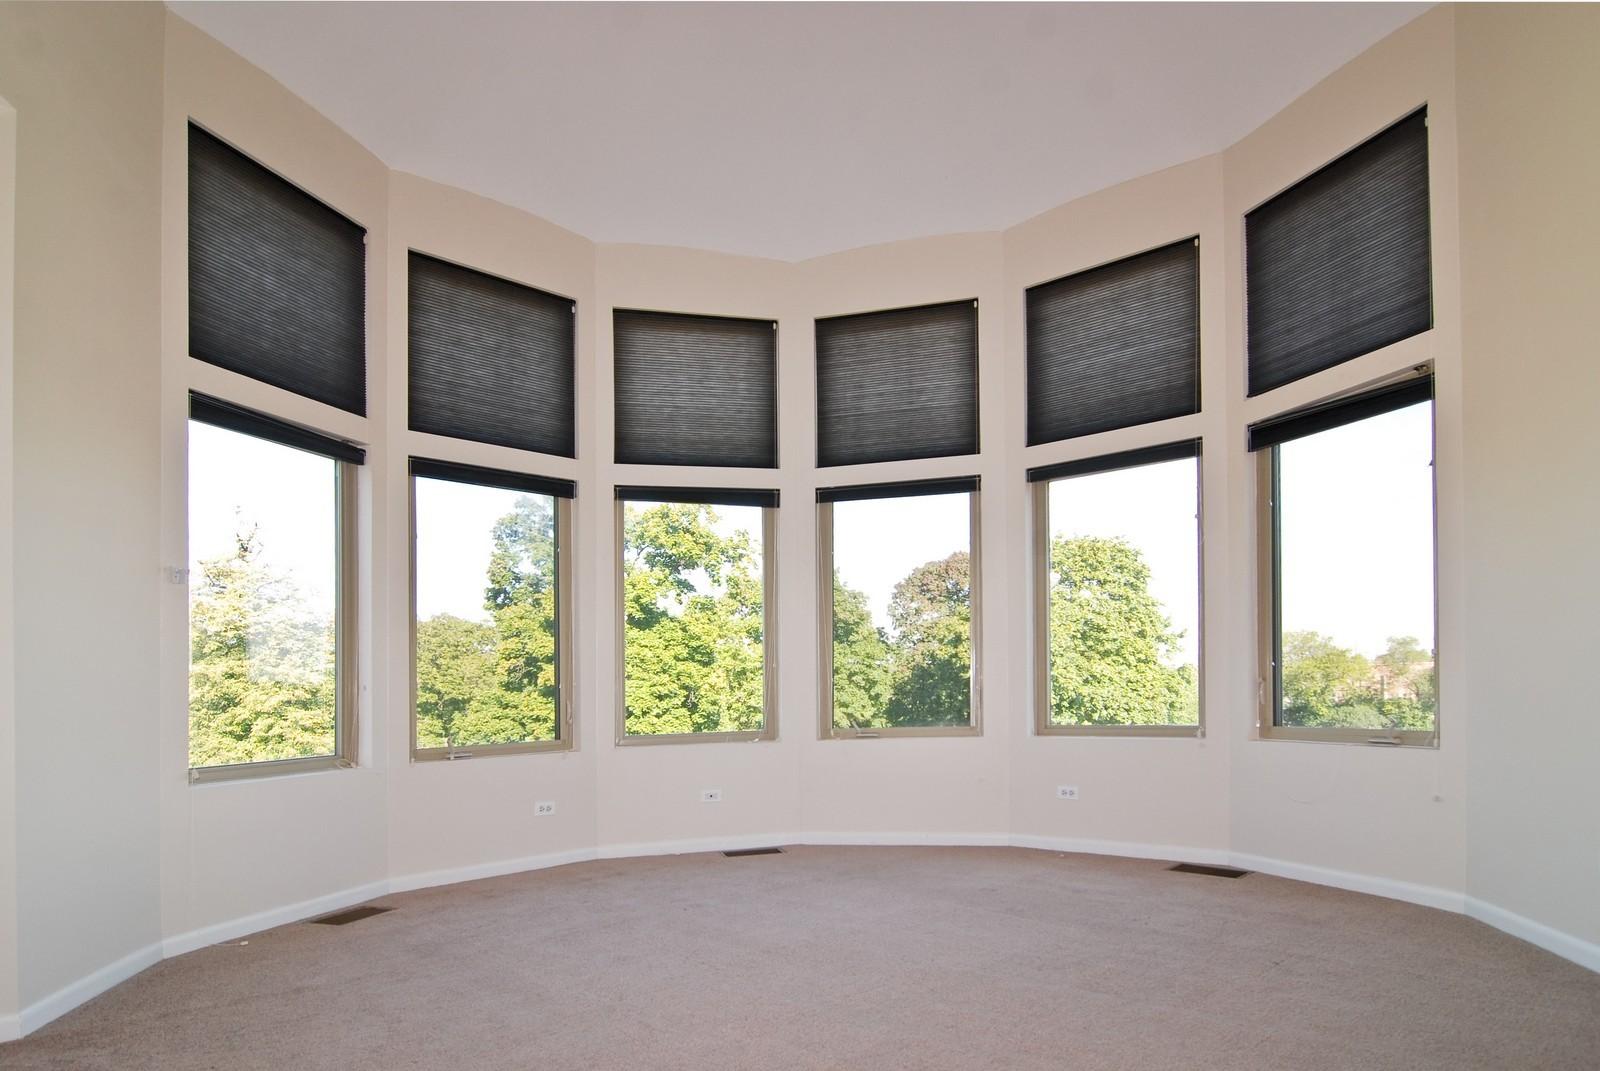 Real Estate Photography - 827 Dunlop, Forest Park, IL, 60130 - Master Bedroom